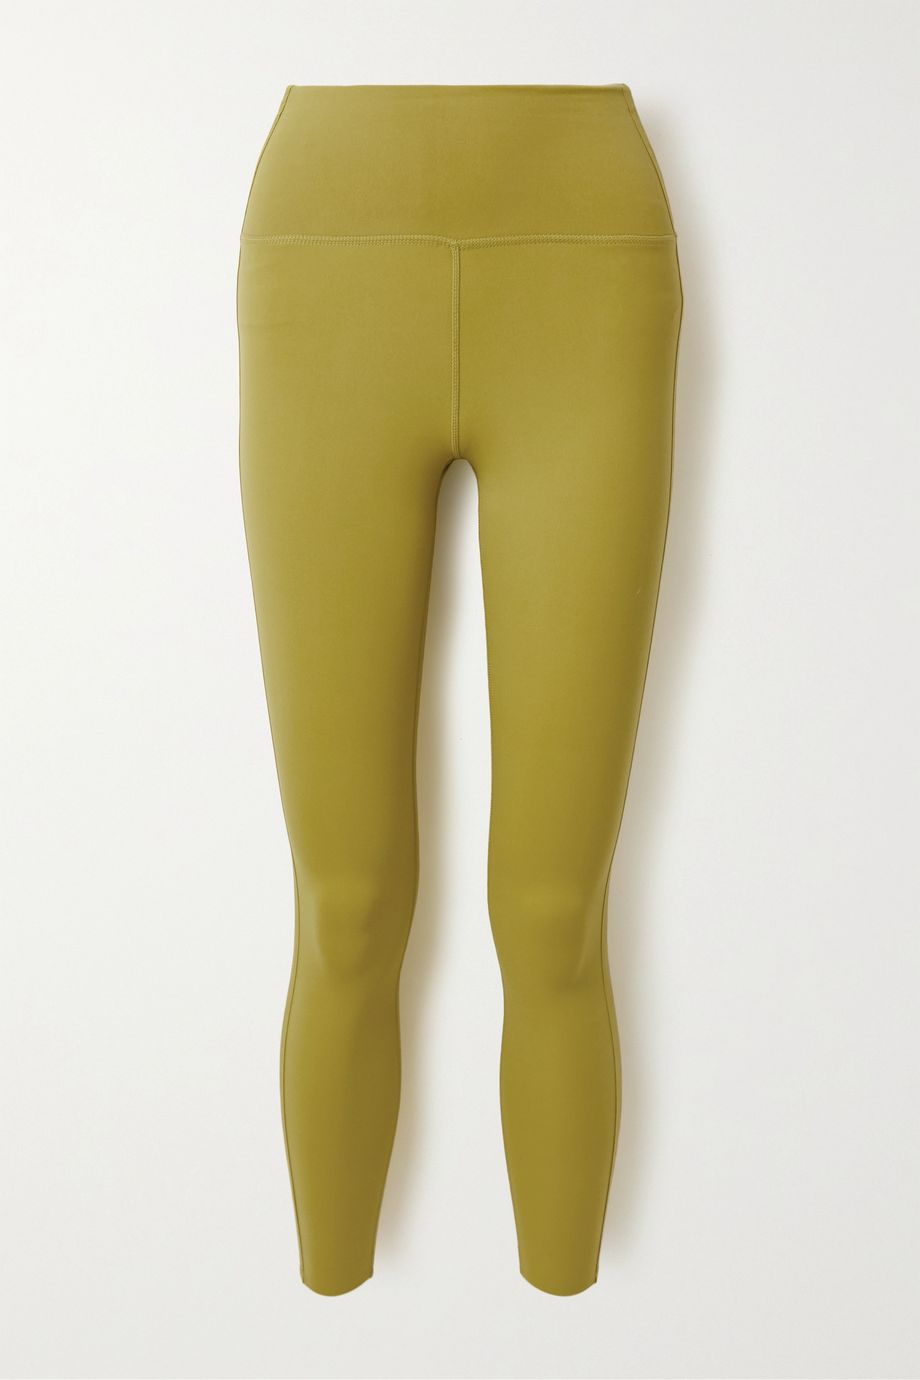 Nike Yoga Luxe Dri-FIT leggings